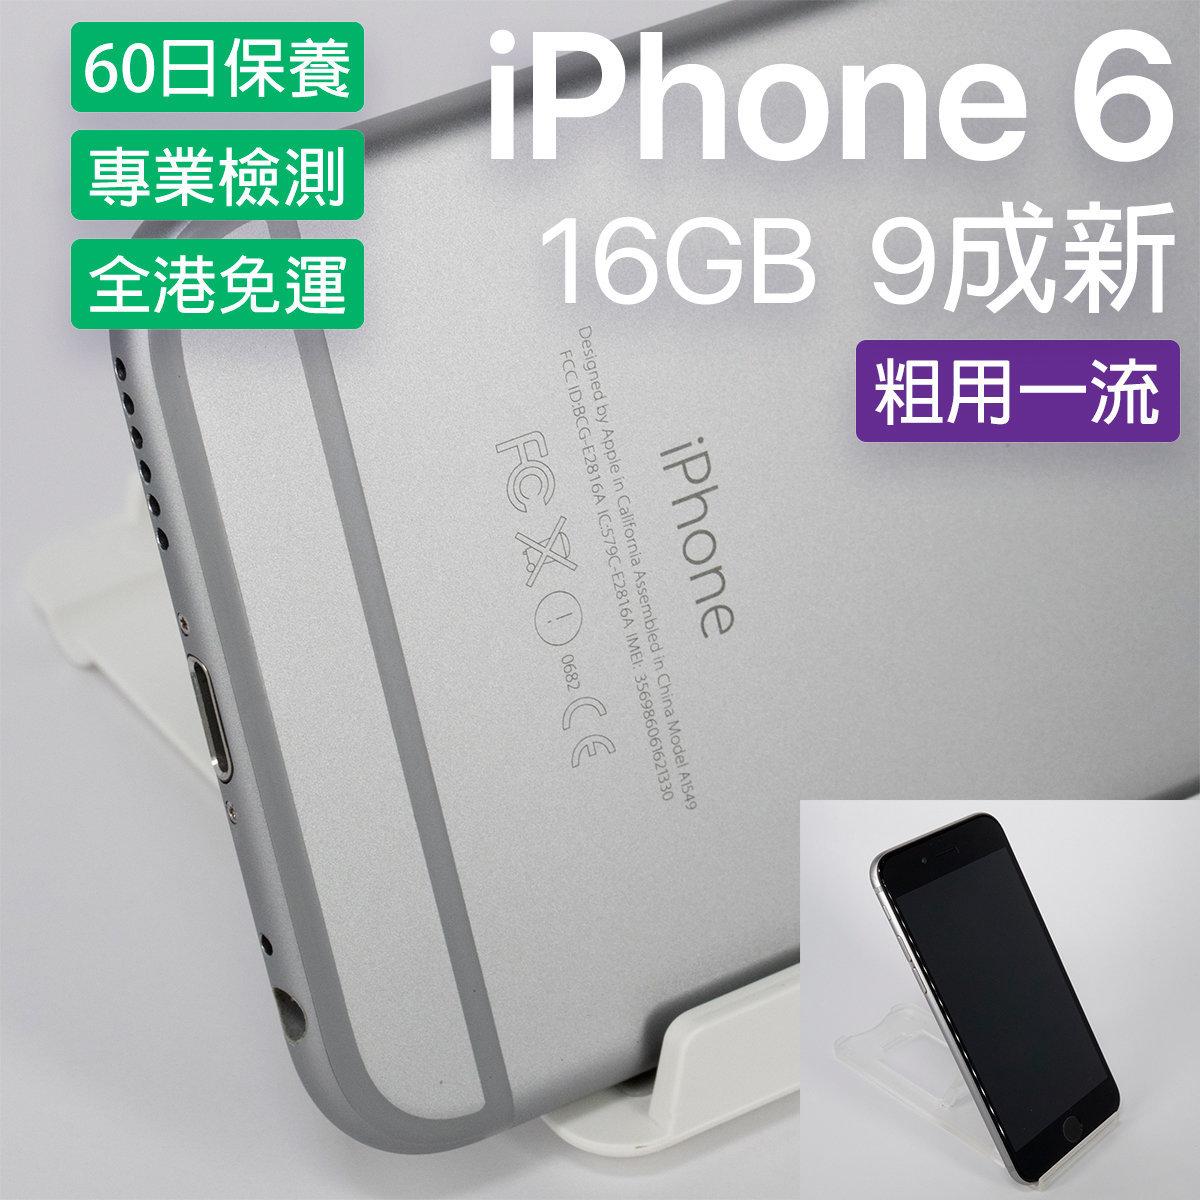 iPhone 6 - 16GB, 二手9成新 (100%正常運作)(平行進口)